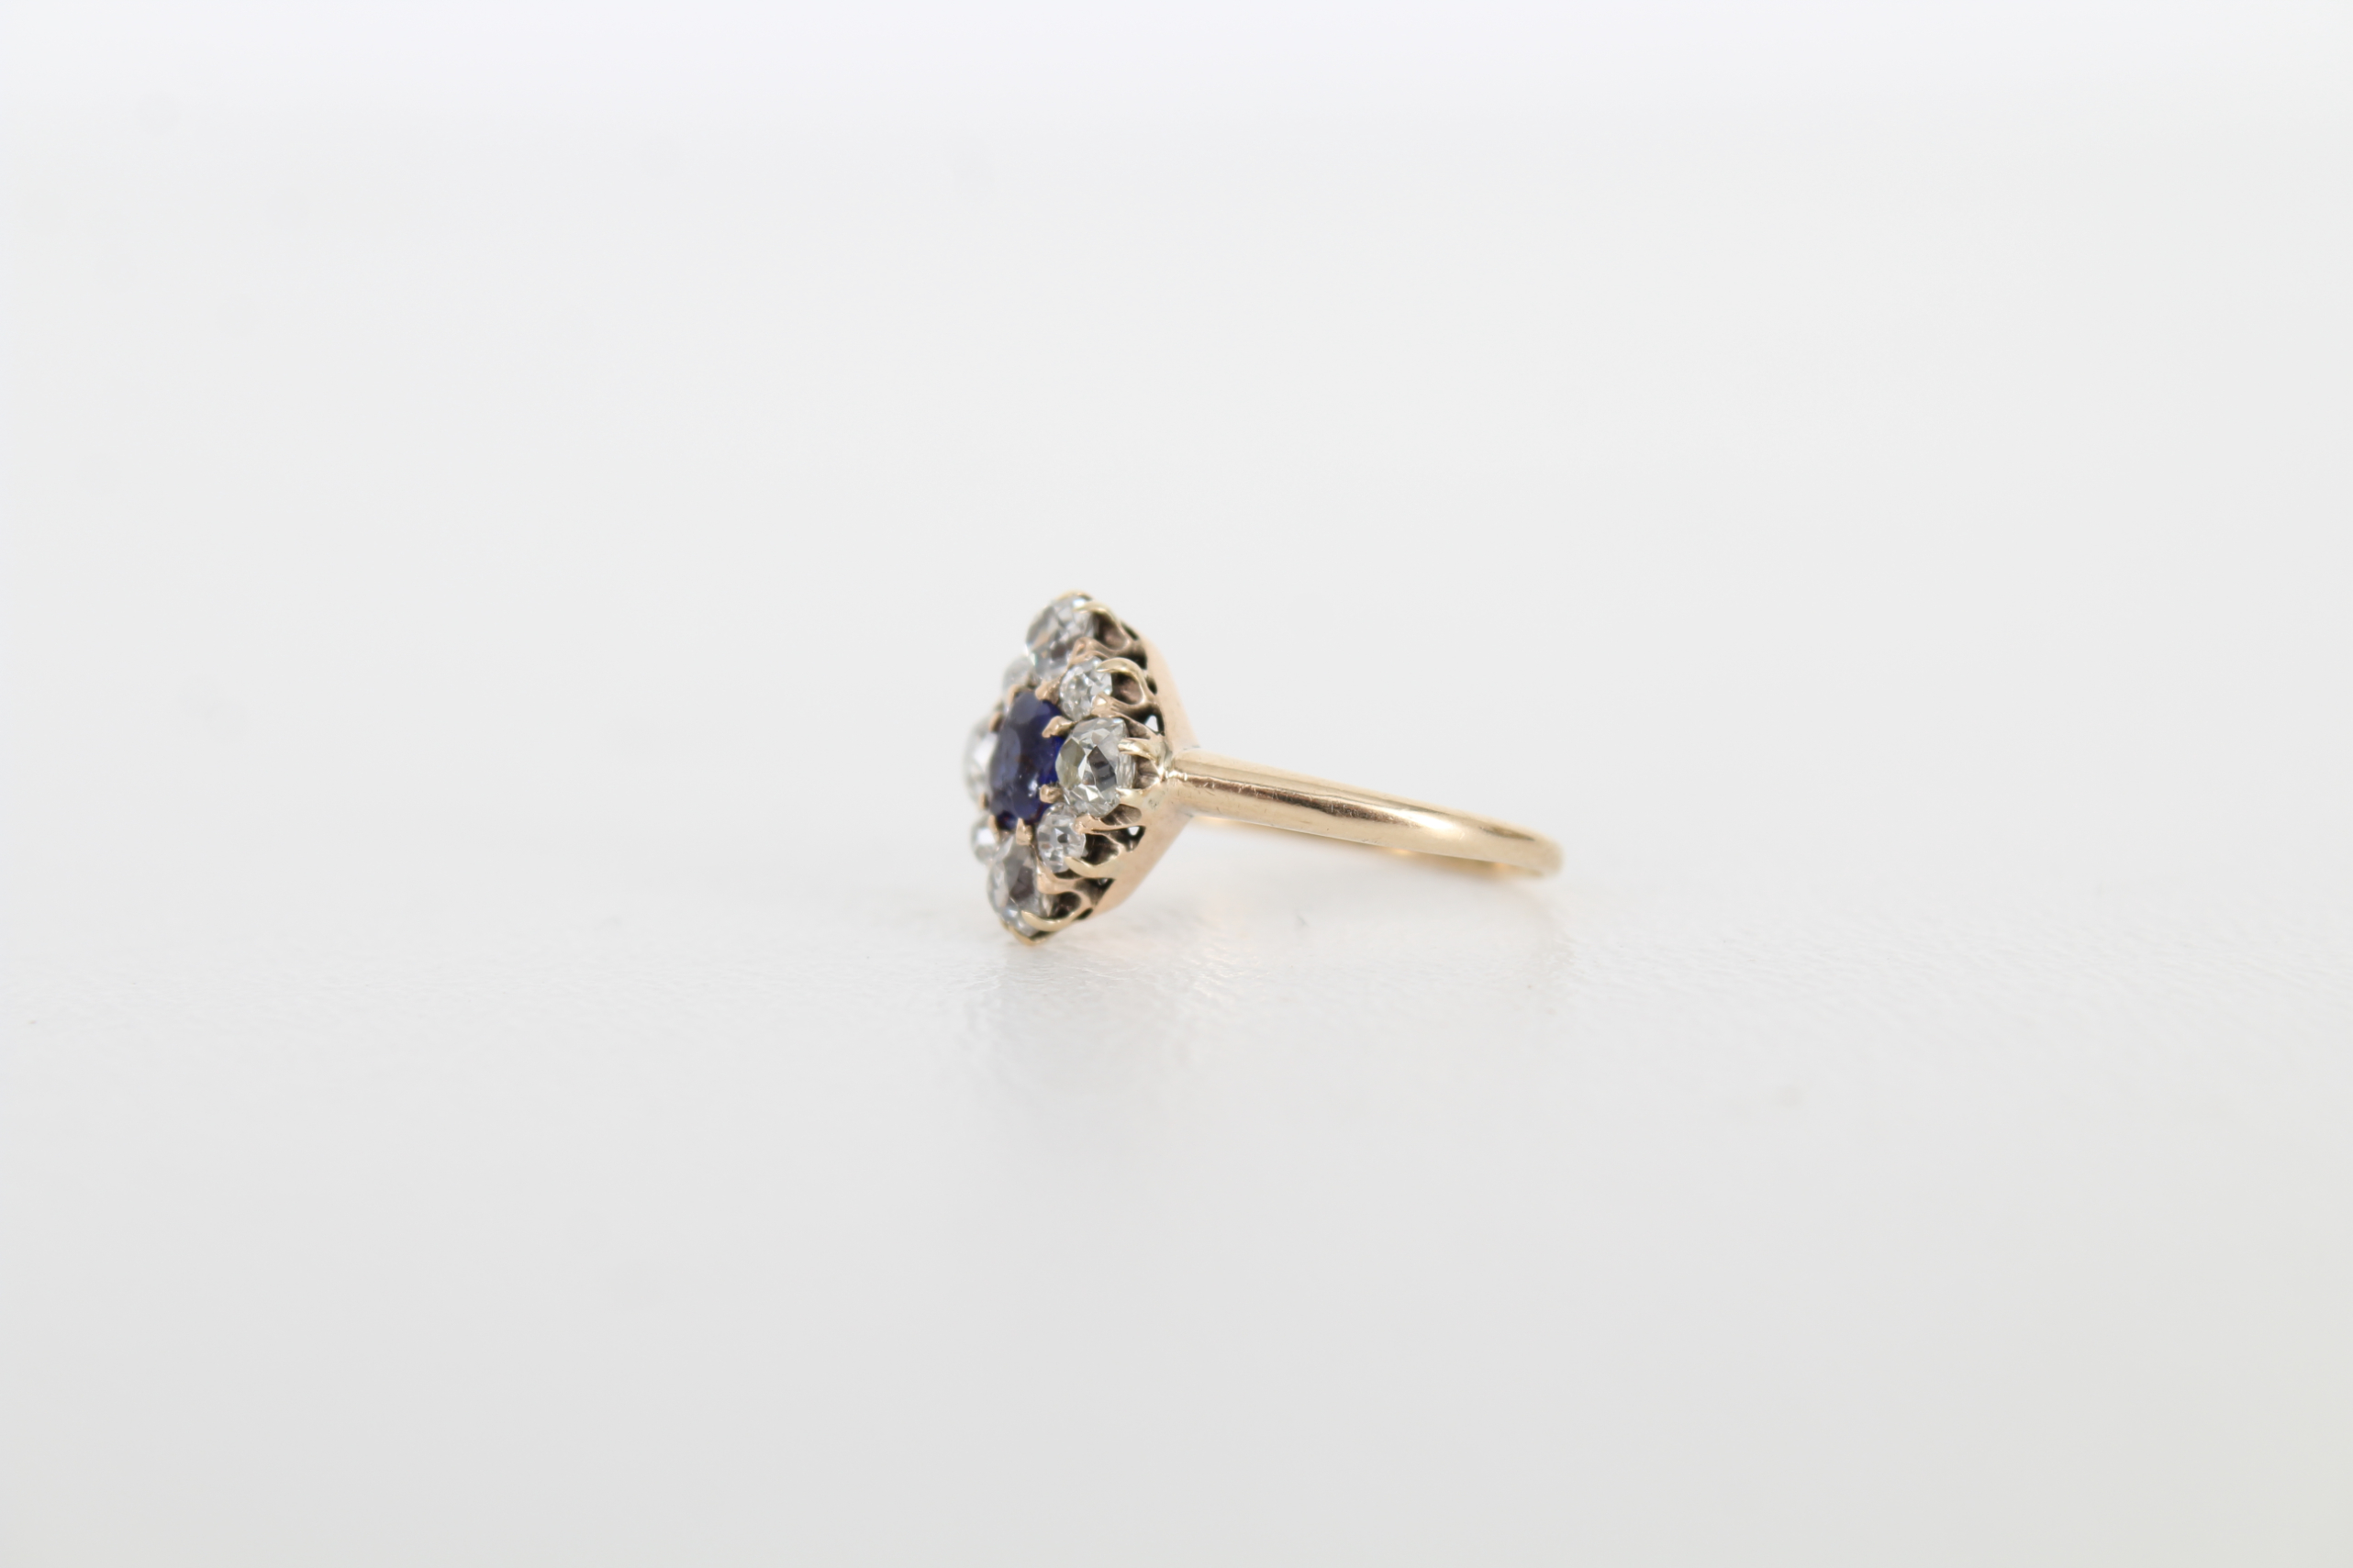 Sapphire & Diamond Petite Gold Ring - Image 3 of 6